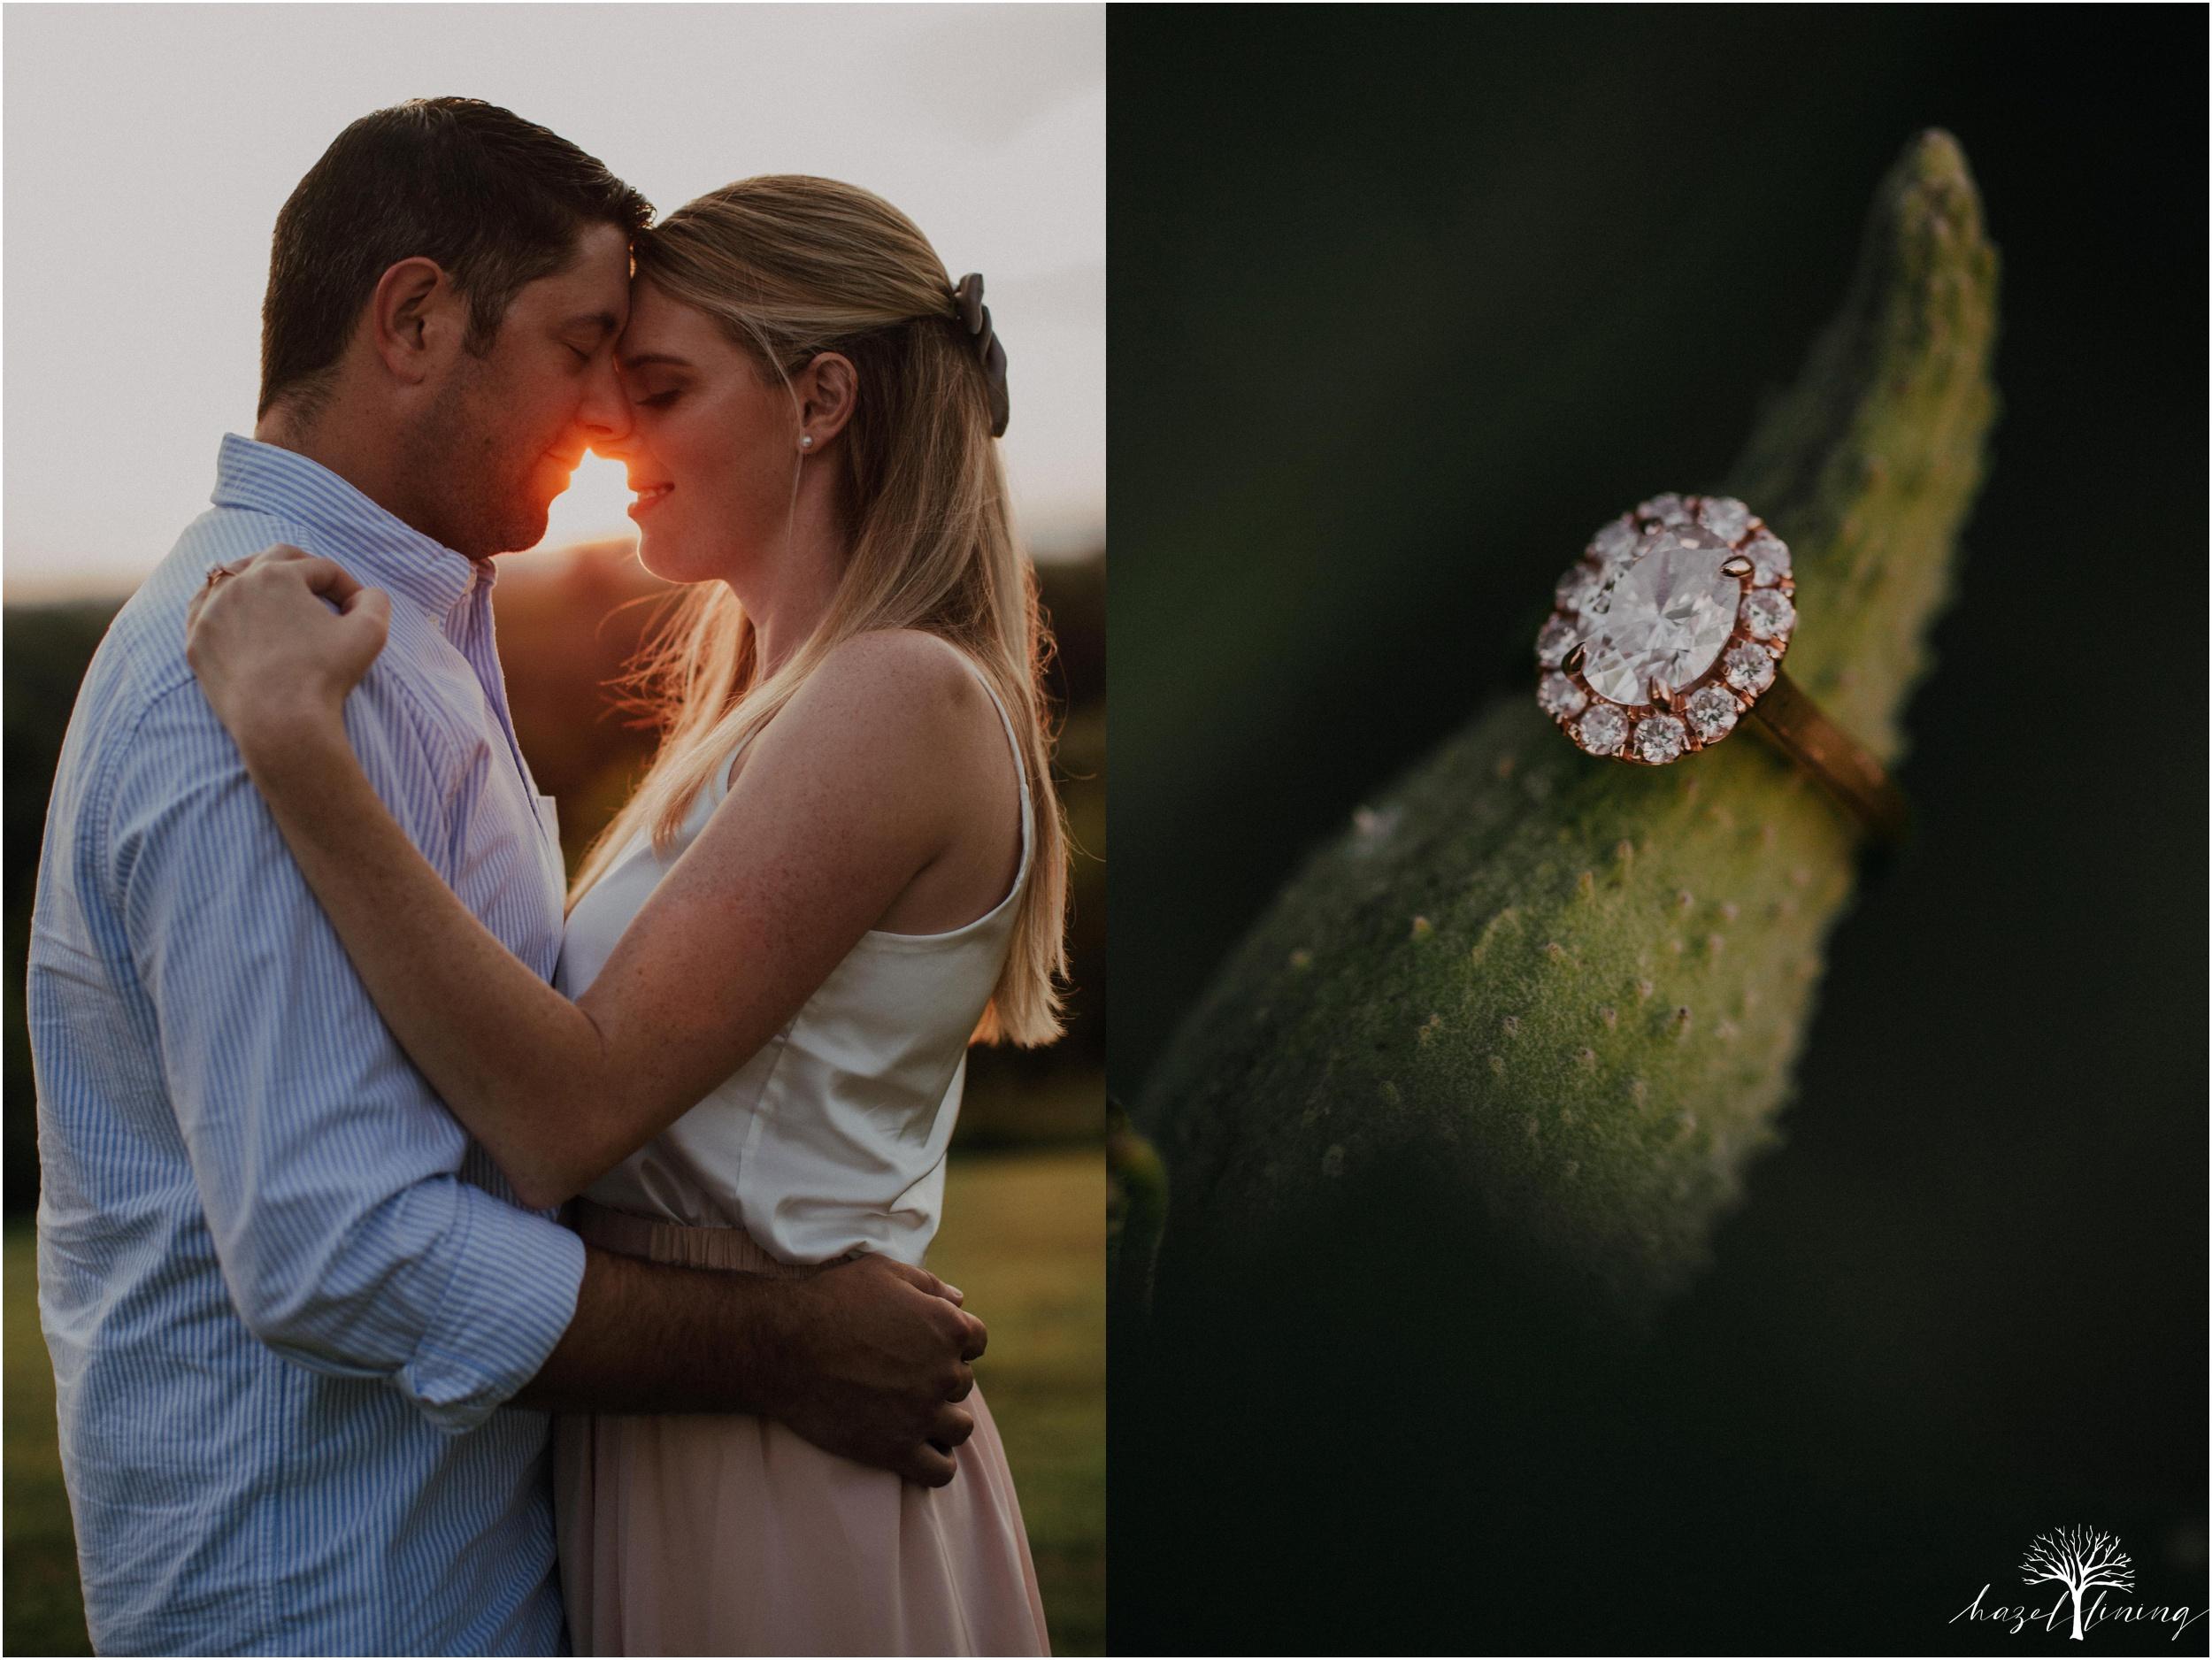 ashley-fillmore-steve-reimer-trexler-nature-preserve-summer-engagement-session-schnecksville-pennsylvania-hazel-lining-photography-destination-elopement-wedding-engagement-photography_0037.jpg